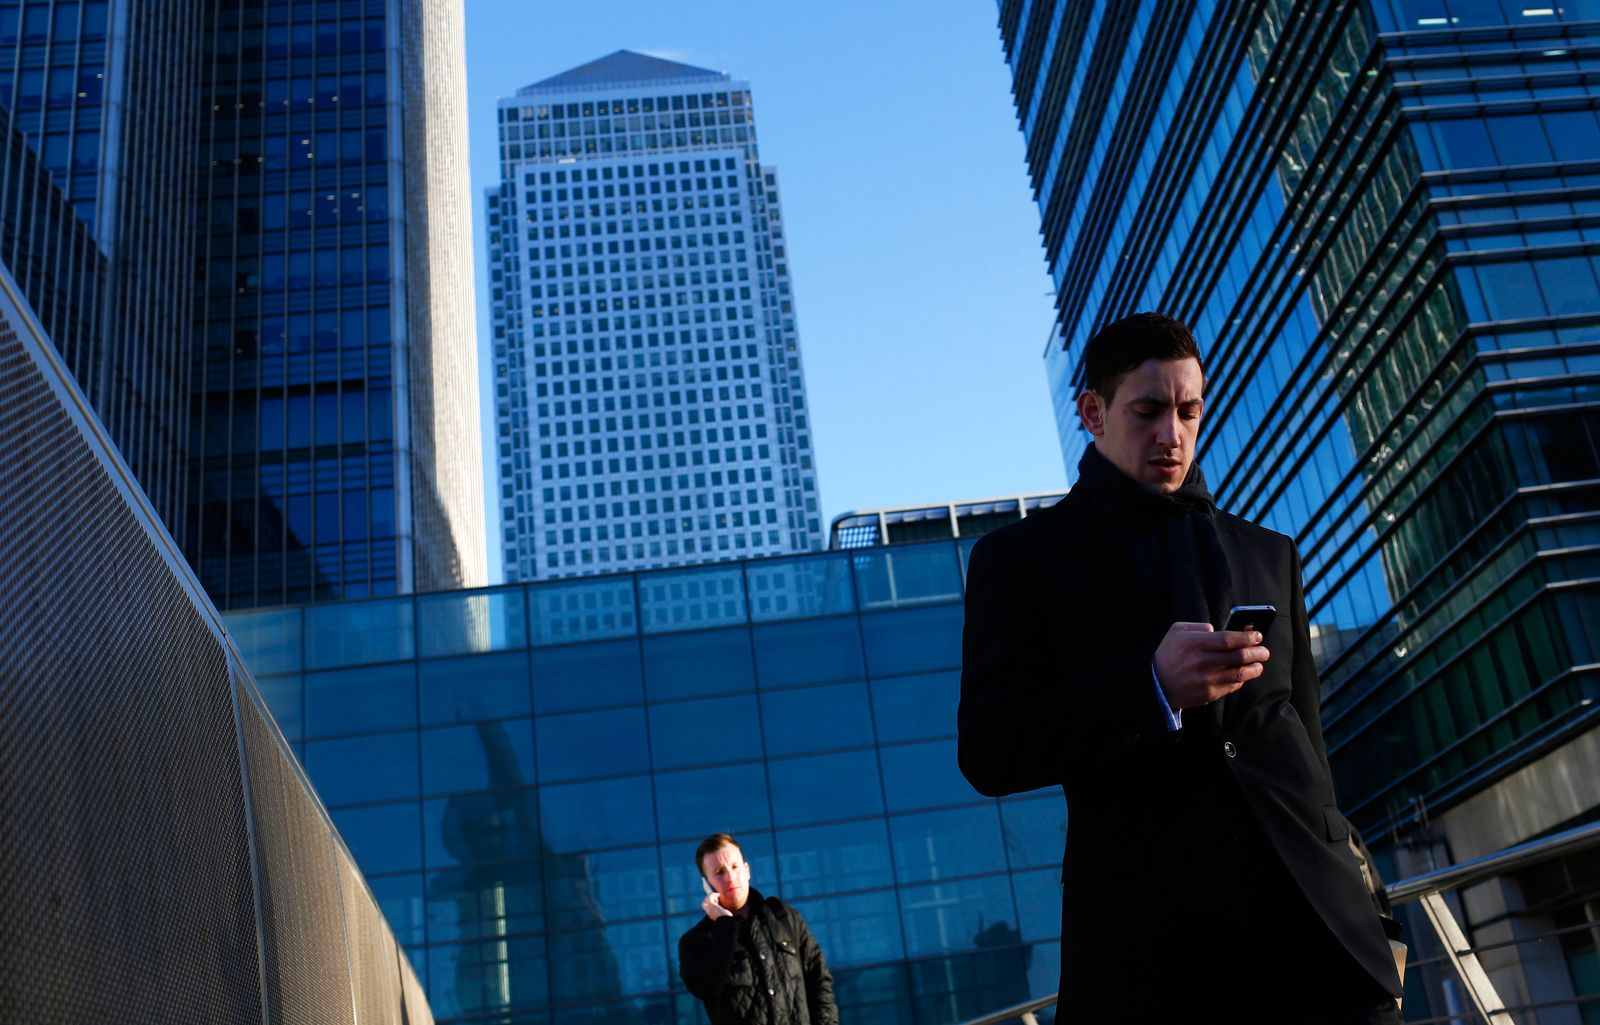 London / Banken-Viertel / Konjunktur / England / Brexit